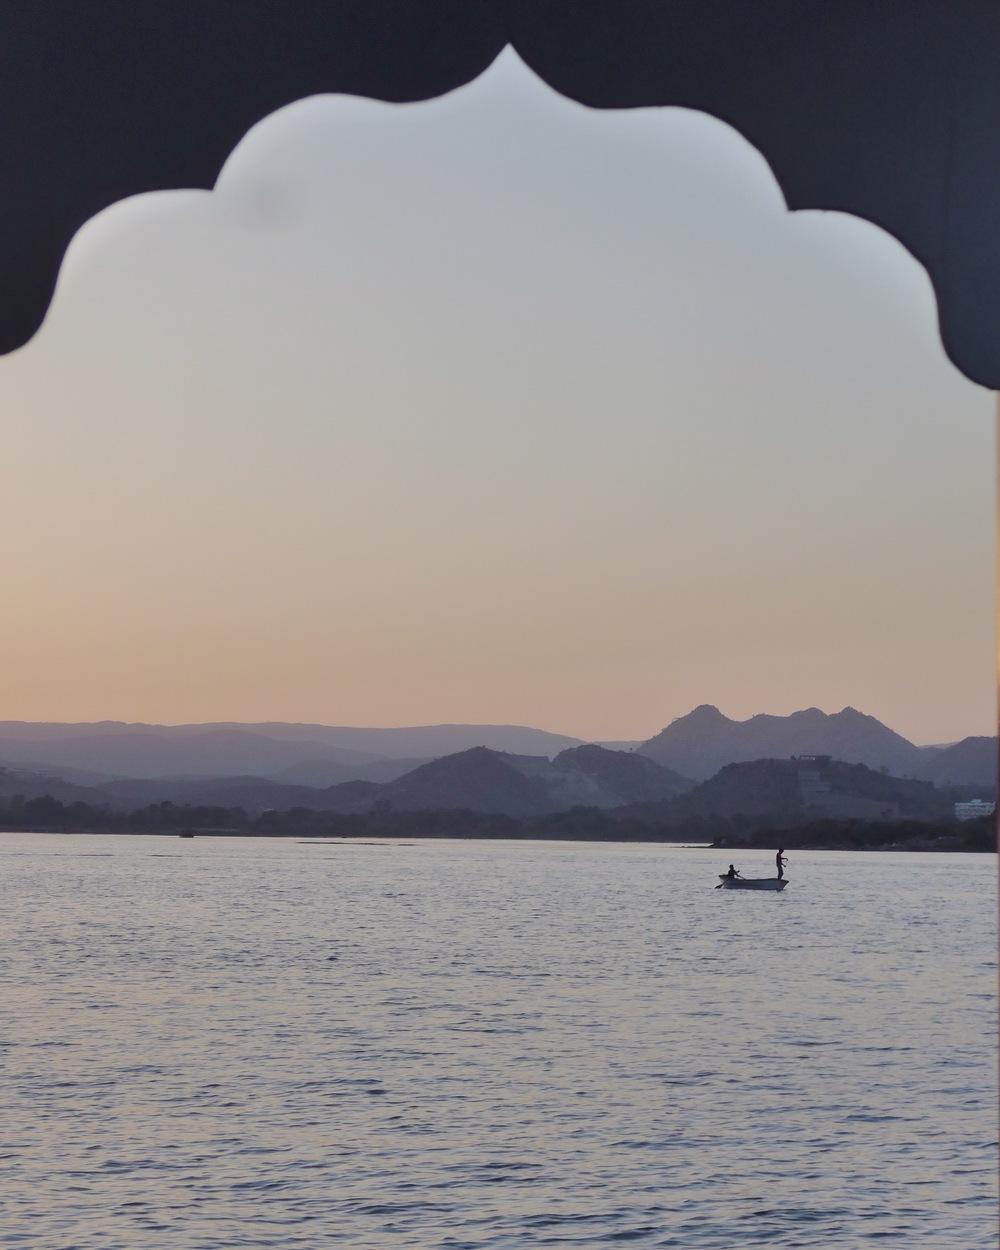 Udaipur Travel